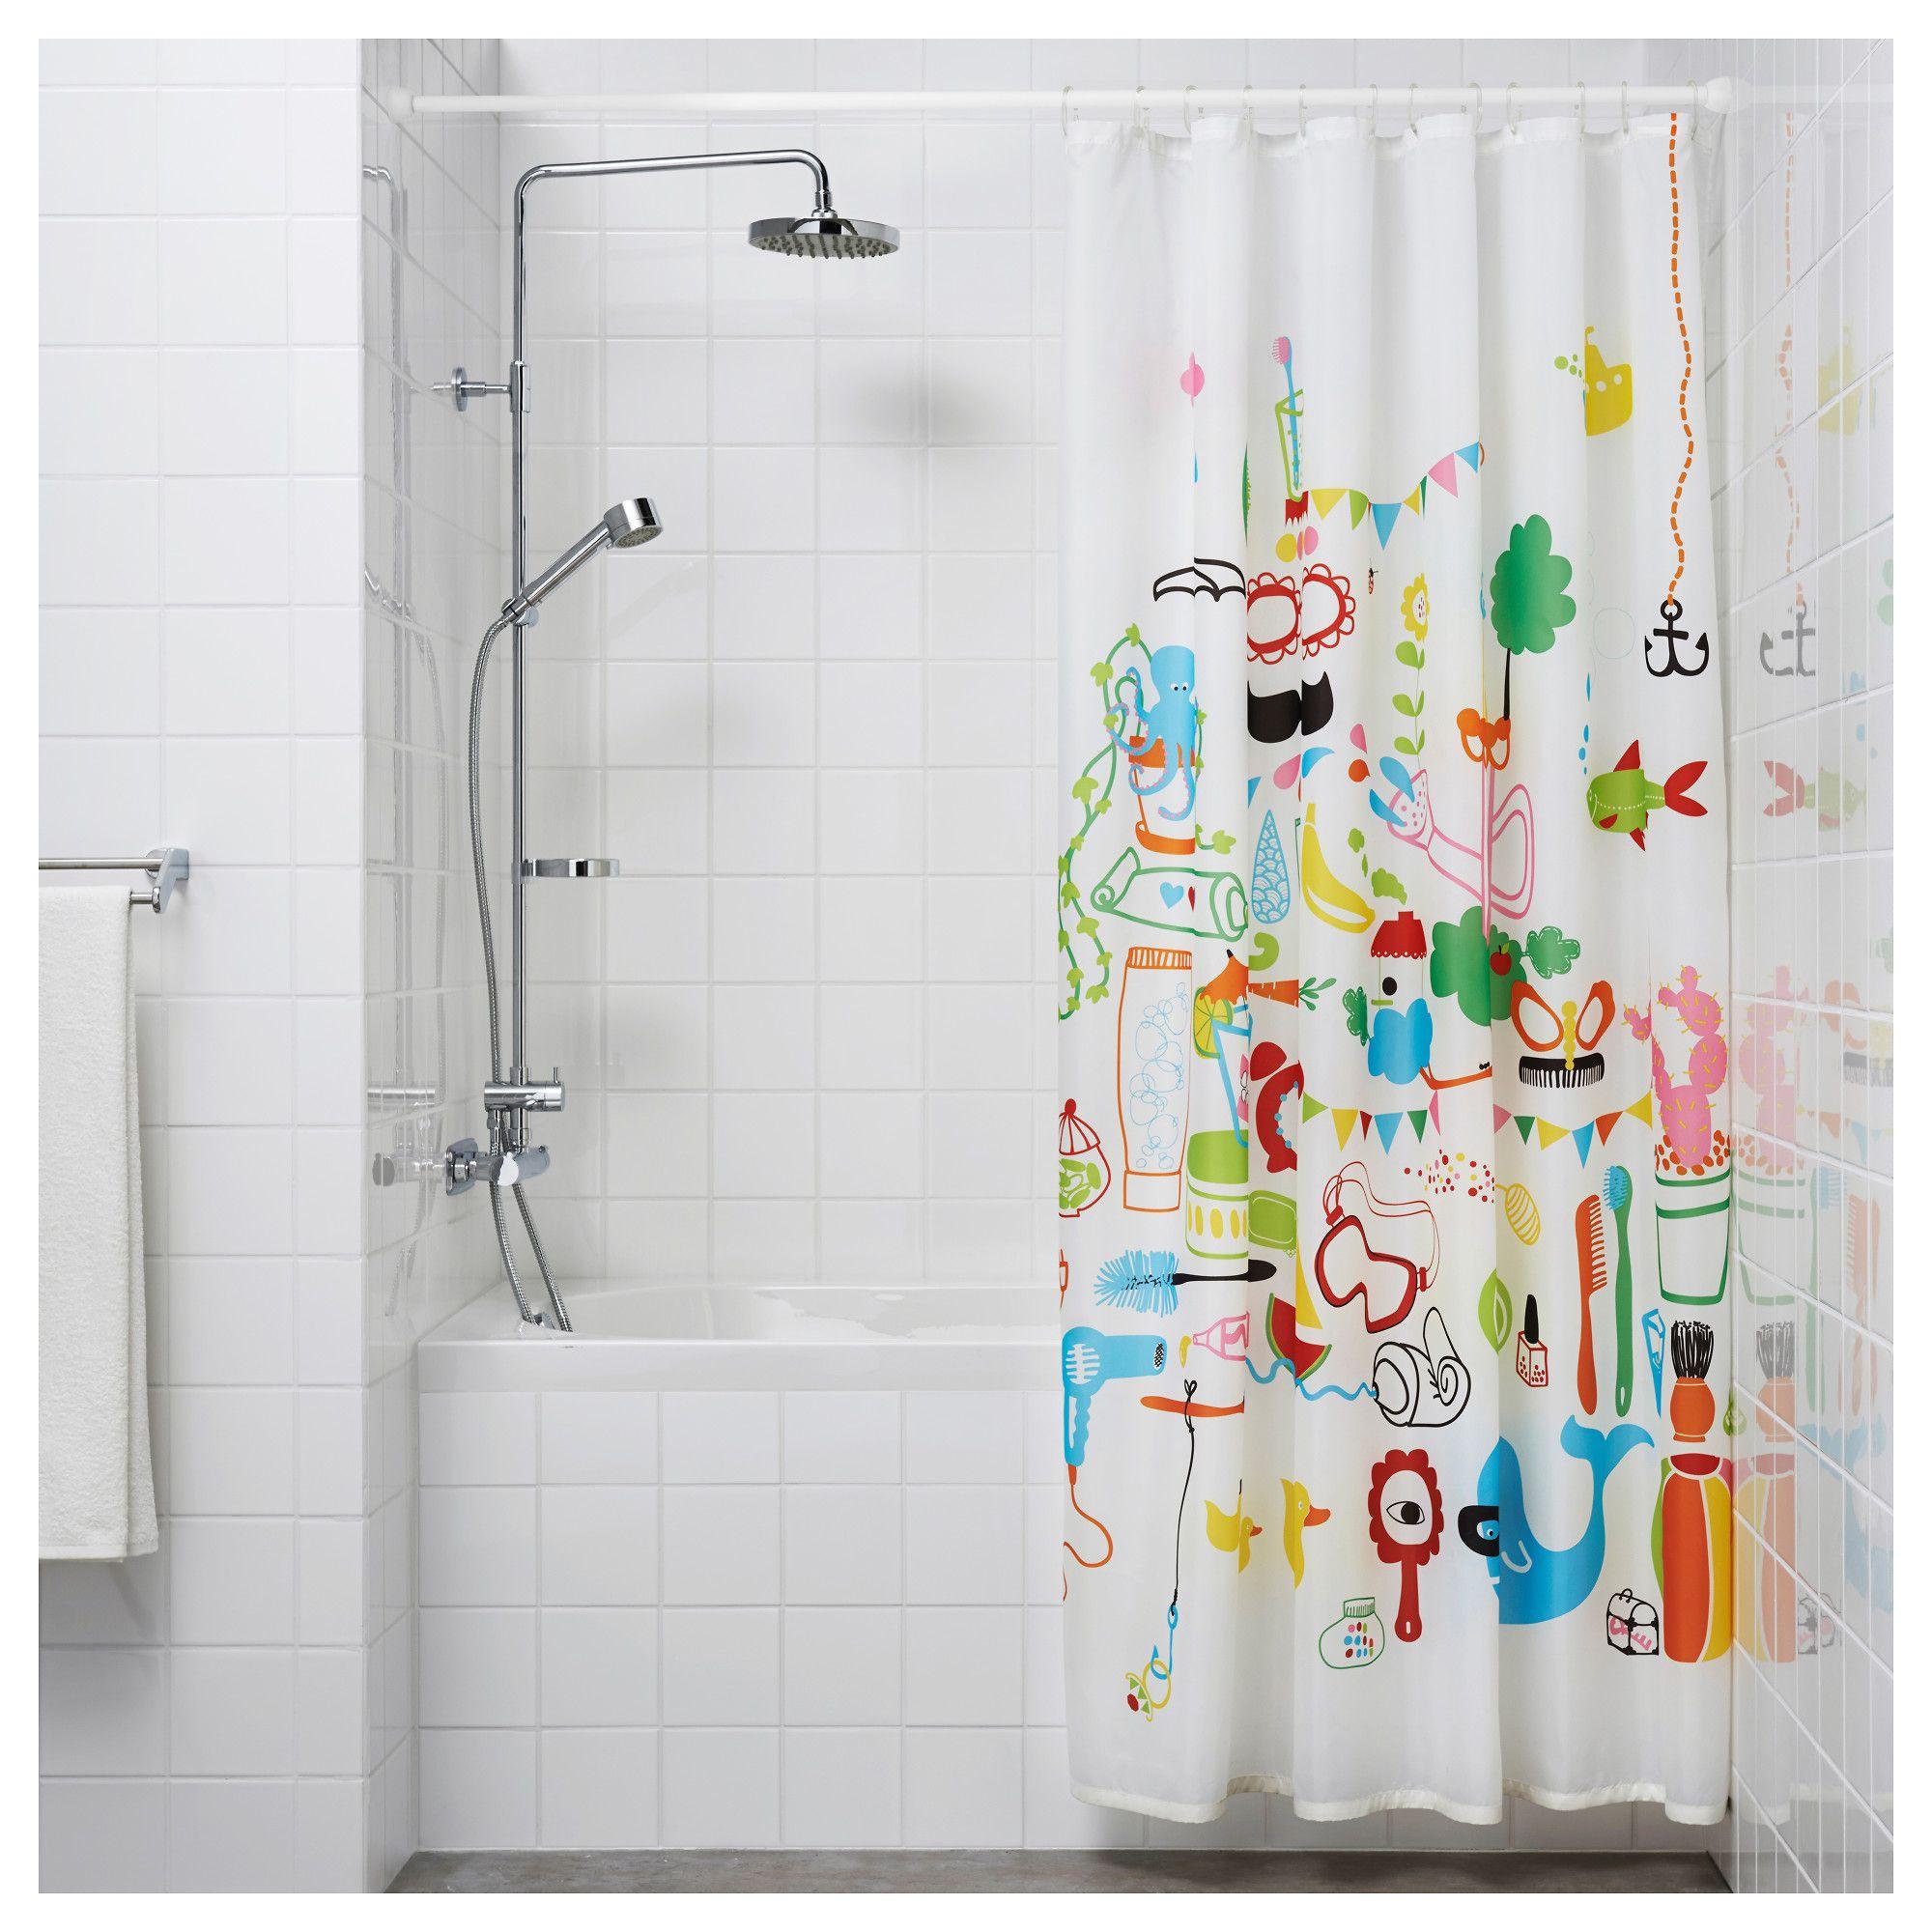 Botaren Shower Curtain Tension Rod White 47 79 120 200 Cm